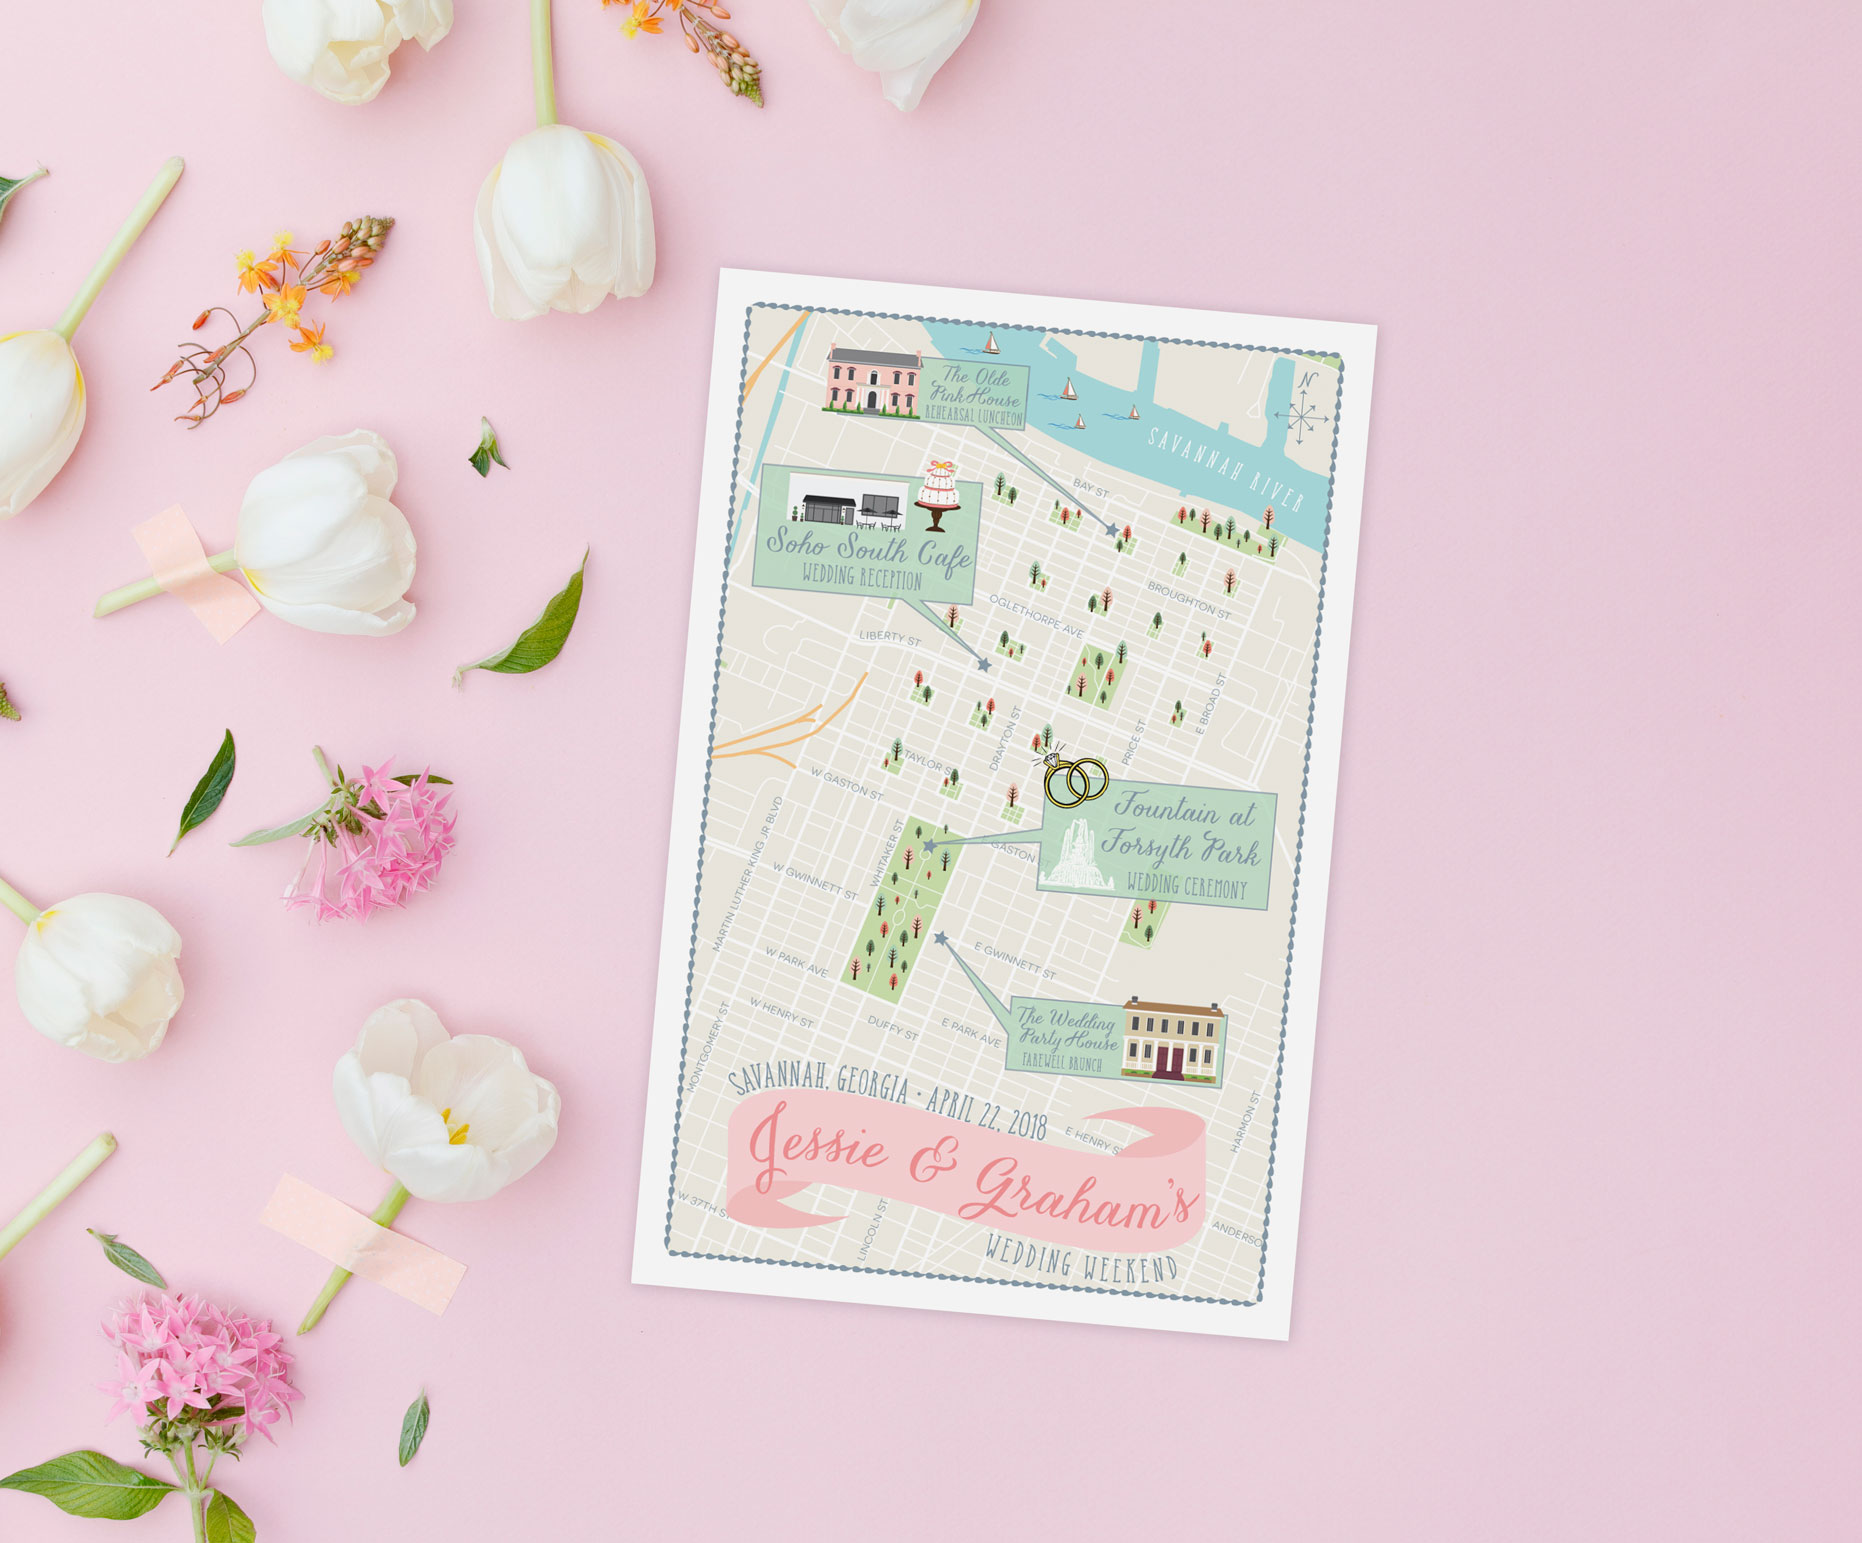 Savannah Georgia Wedding Map by Feathered Heart Prints